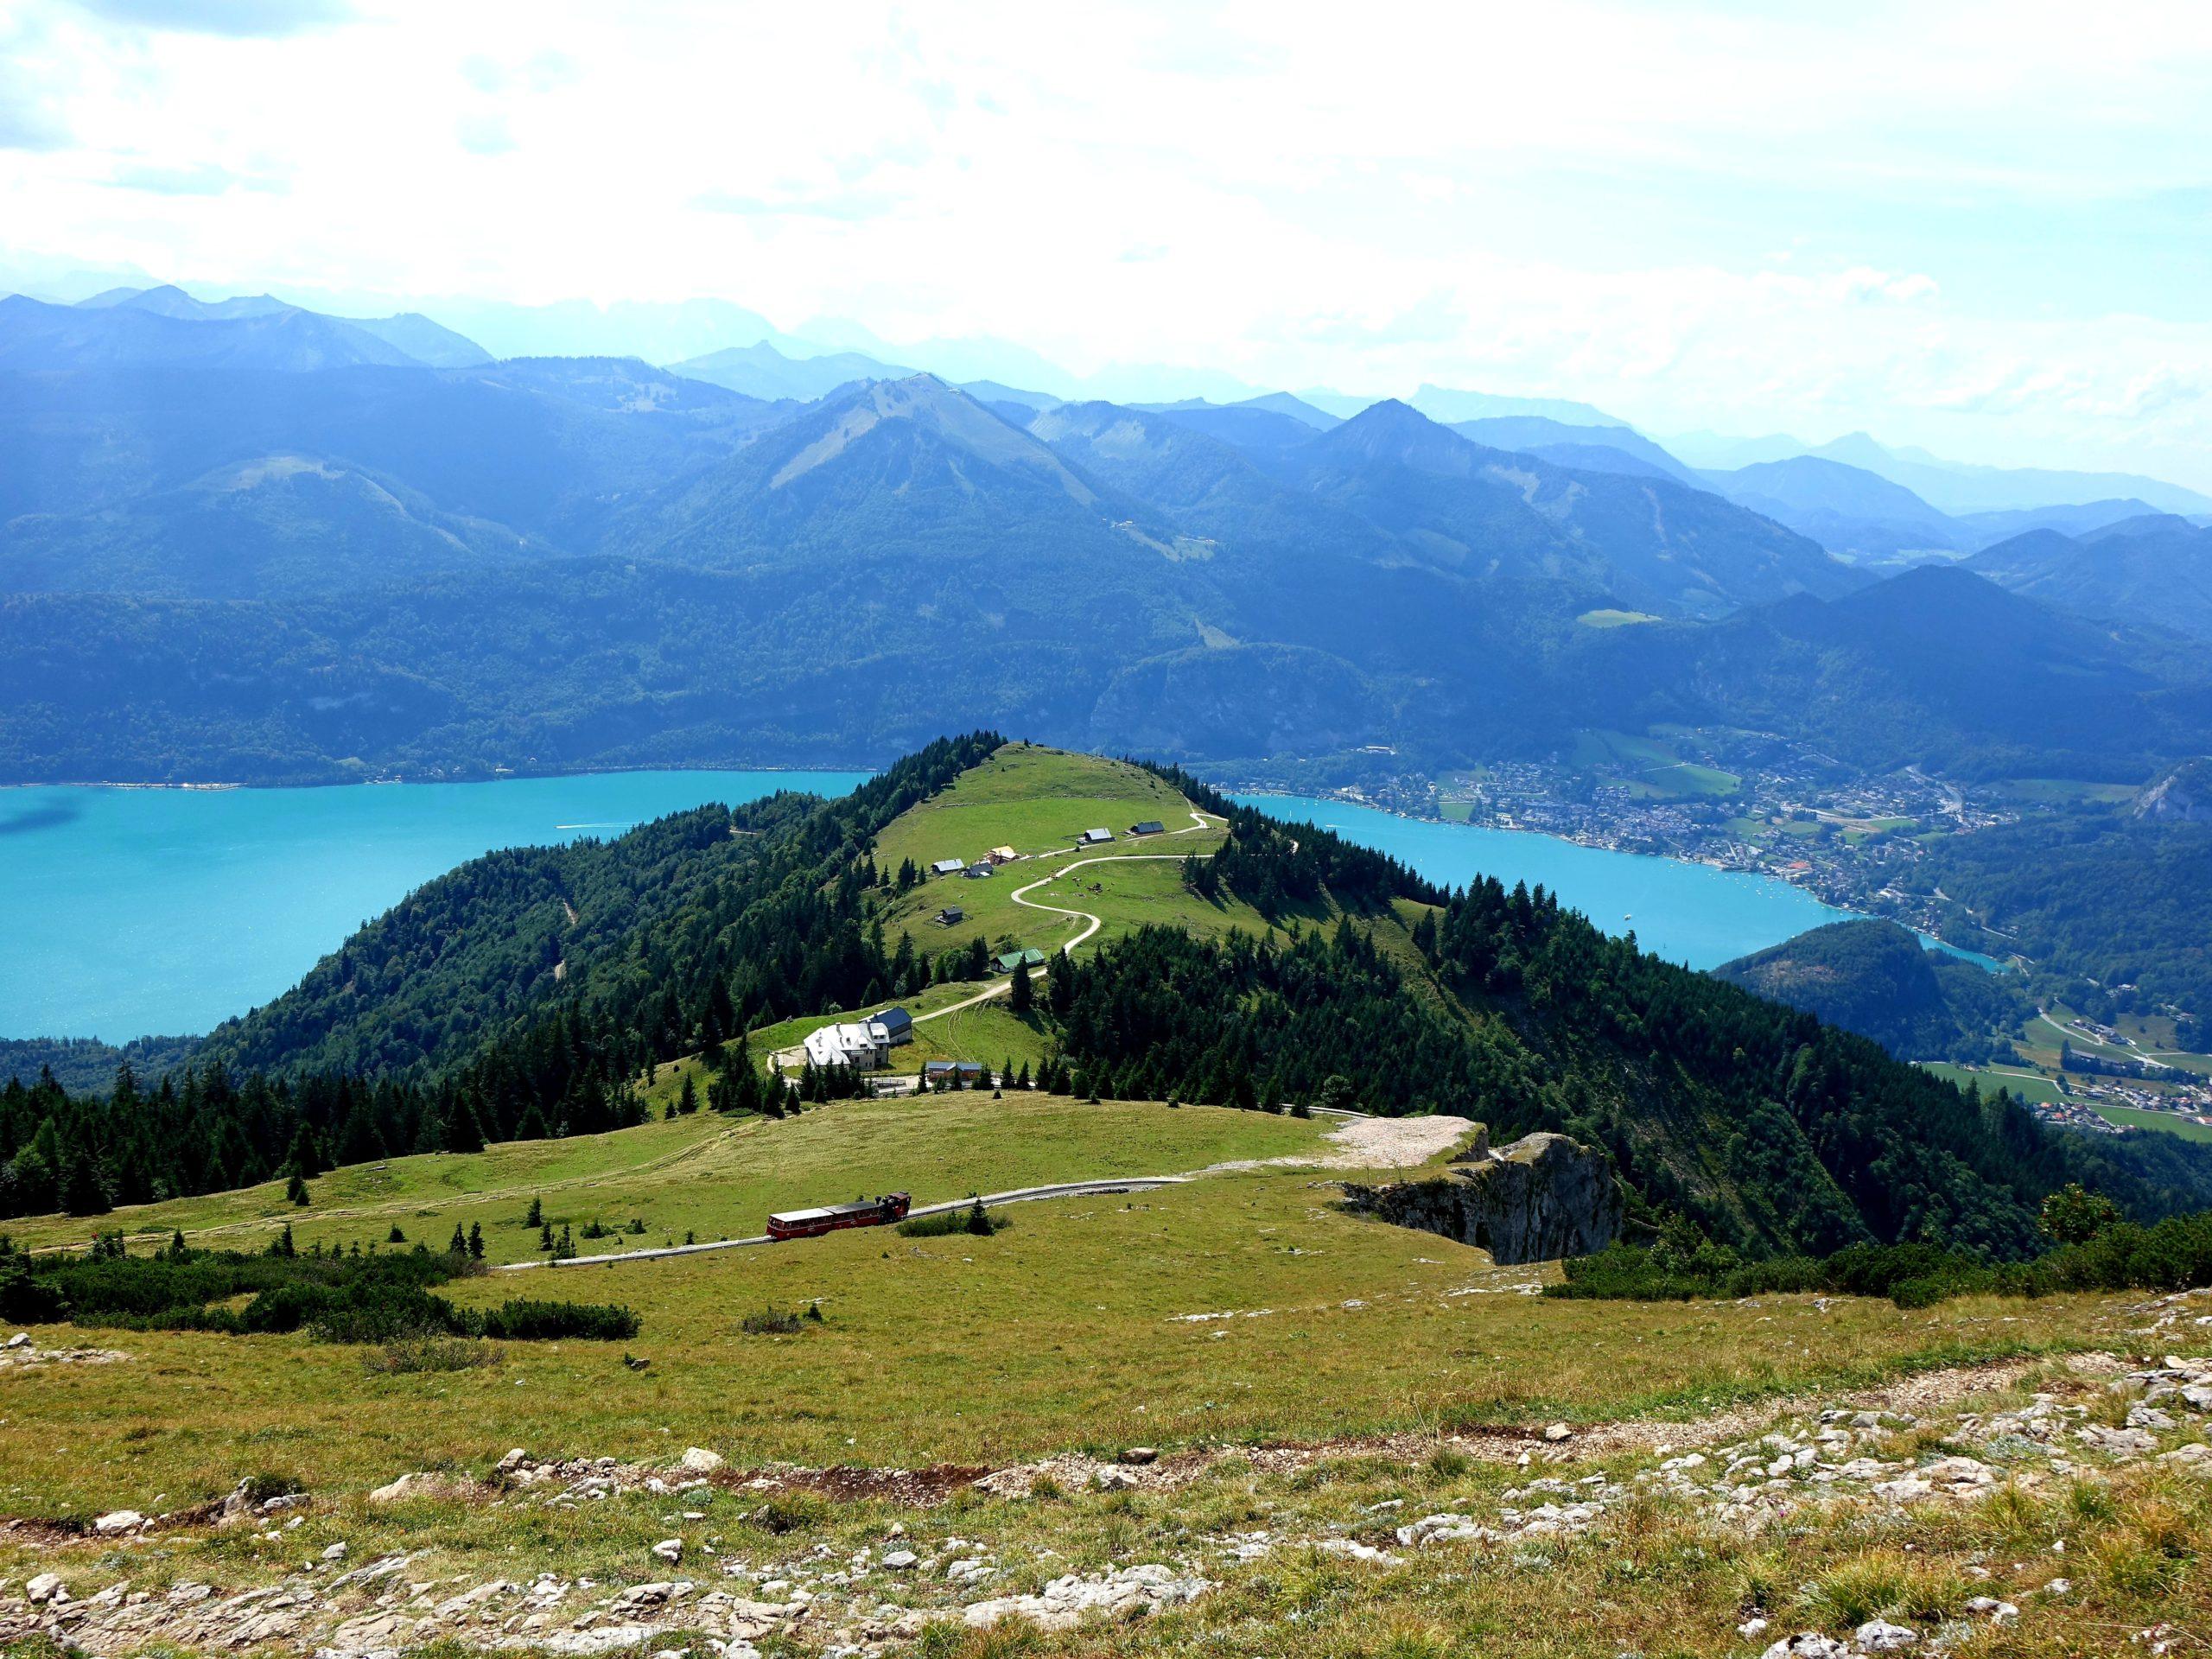 Mount Schafberg